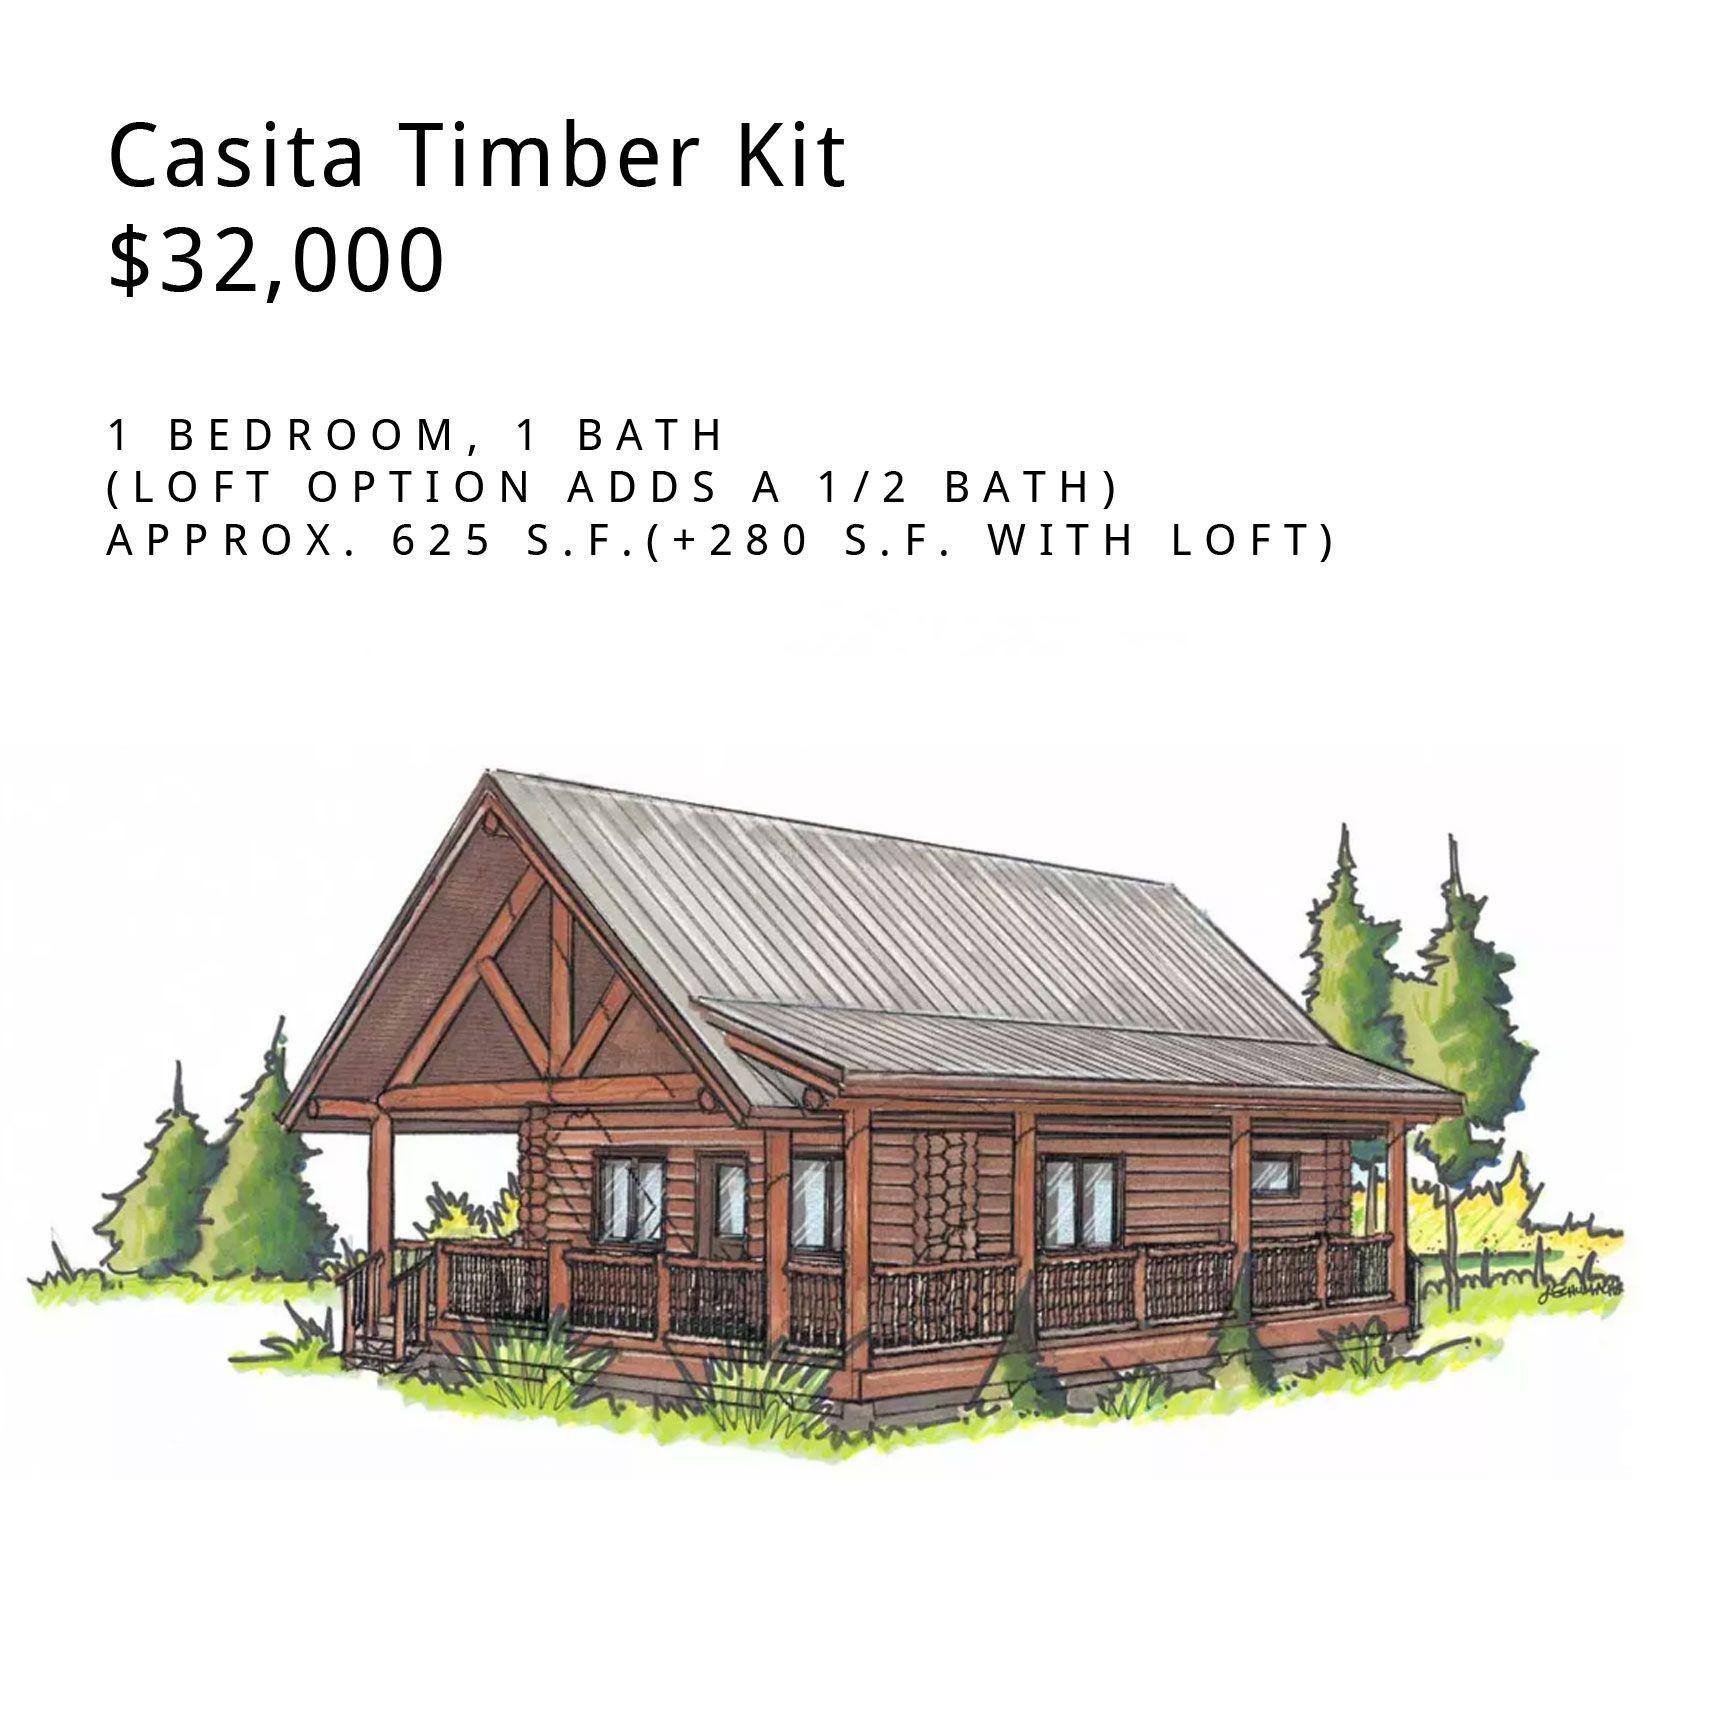 Customizable Log Cabin Kit The Casita Colorado And New Mexico Log Home Kits Log Homes Log Cabin Kits